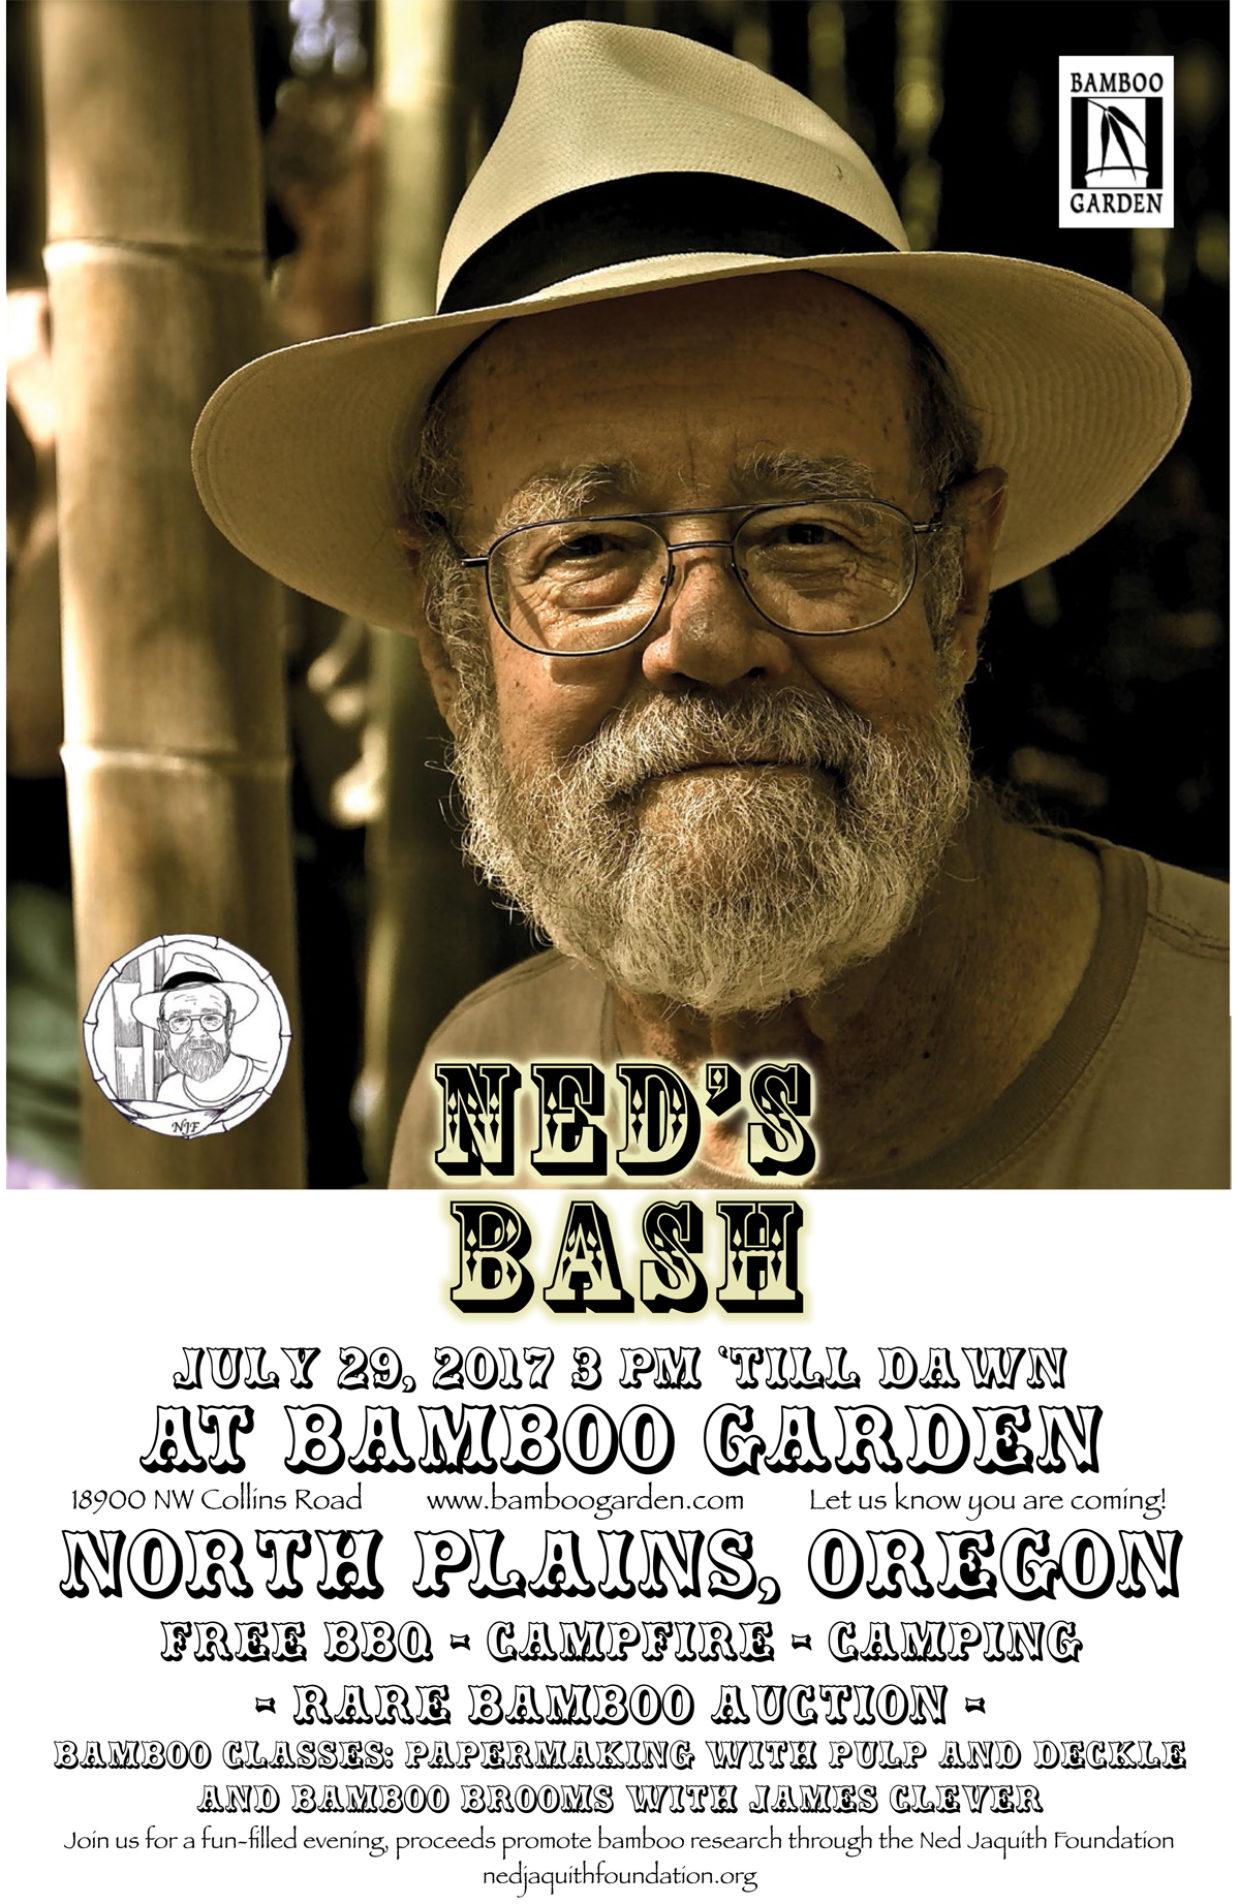 Bamboo Weekend – July 29-30, 2017